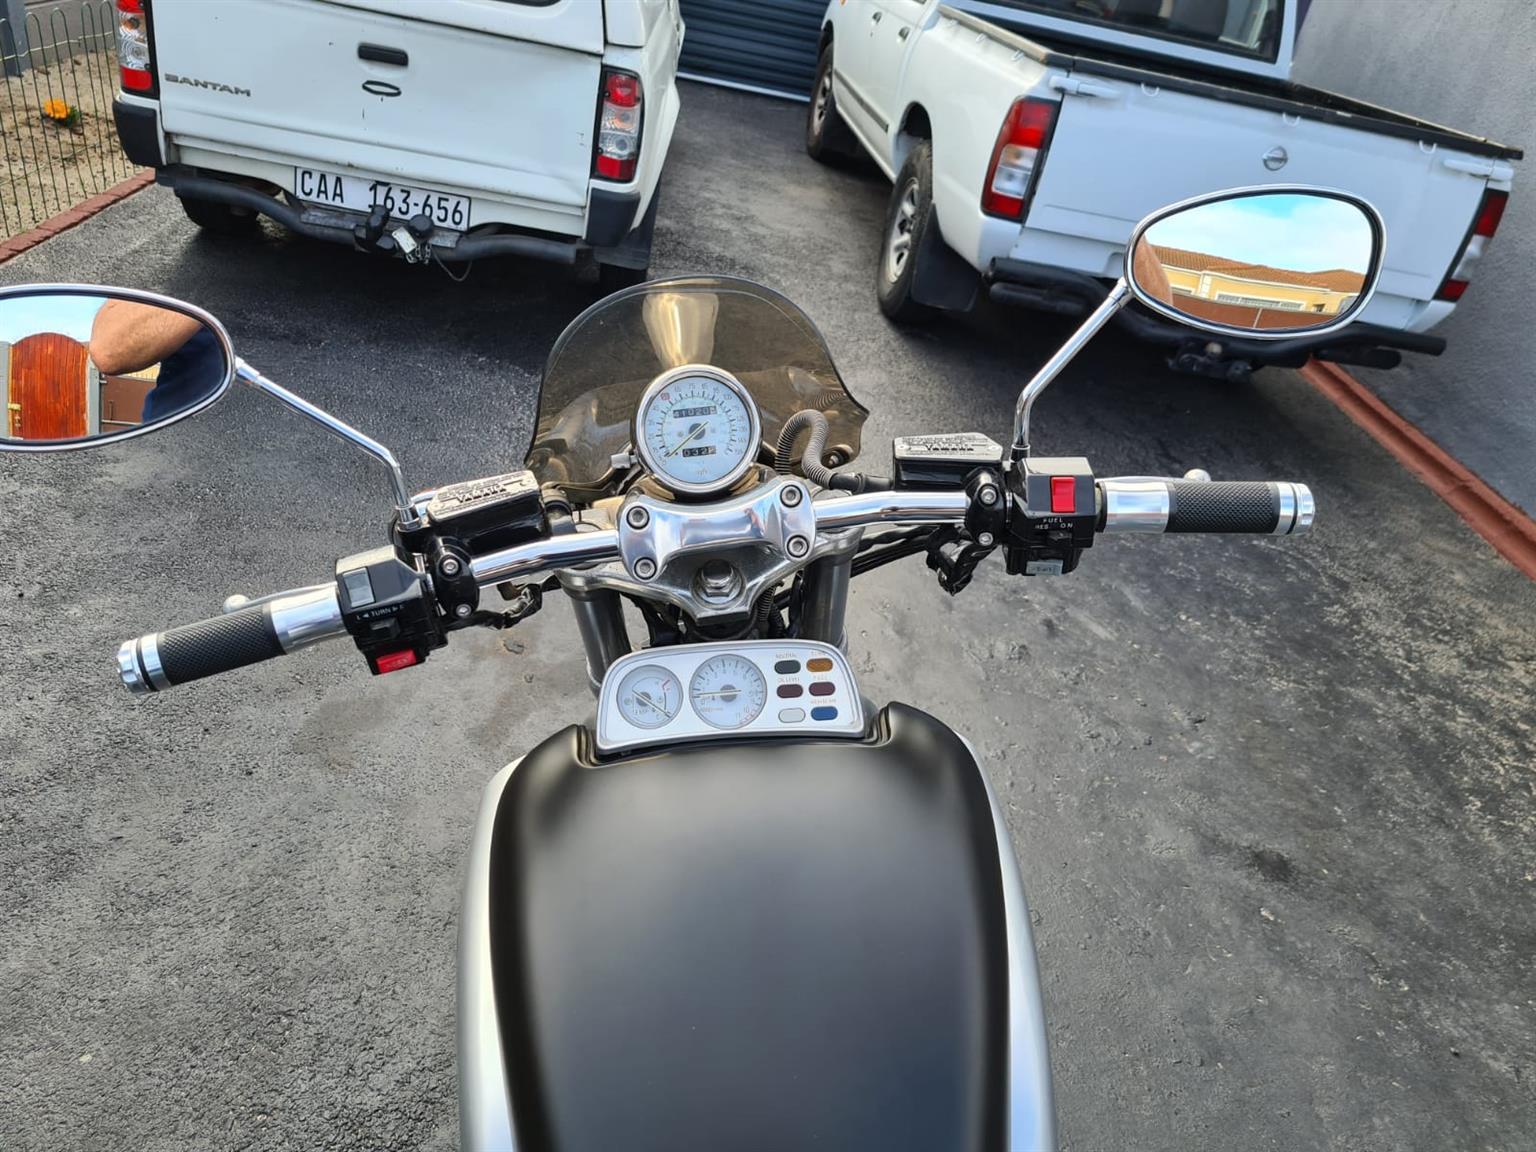 1988 Yamaha V-Max